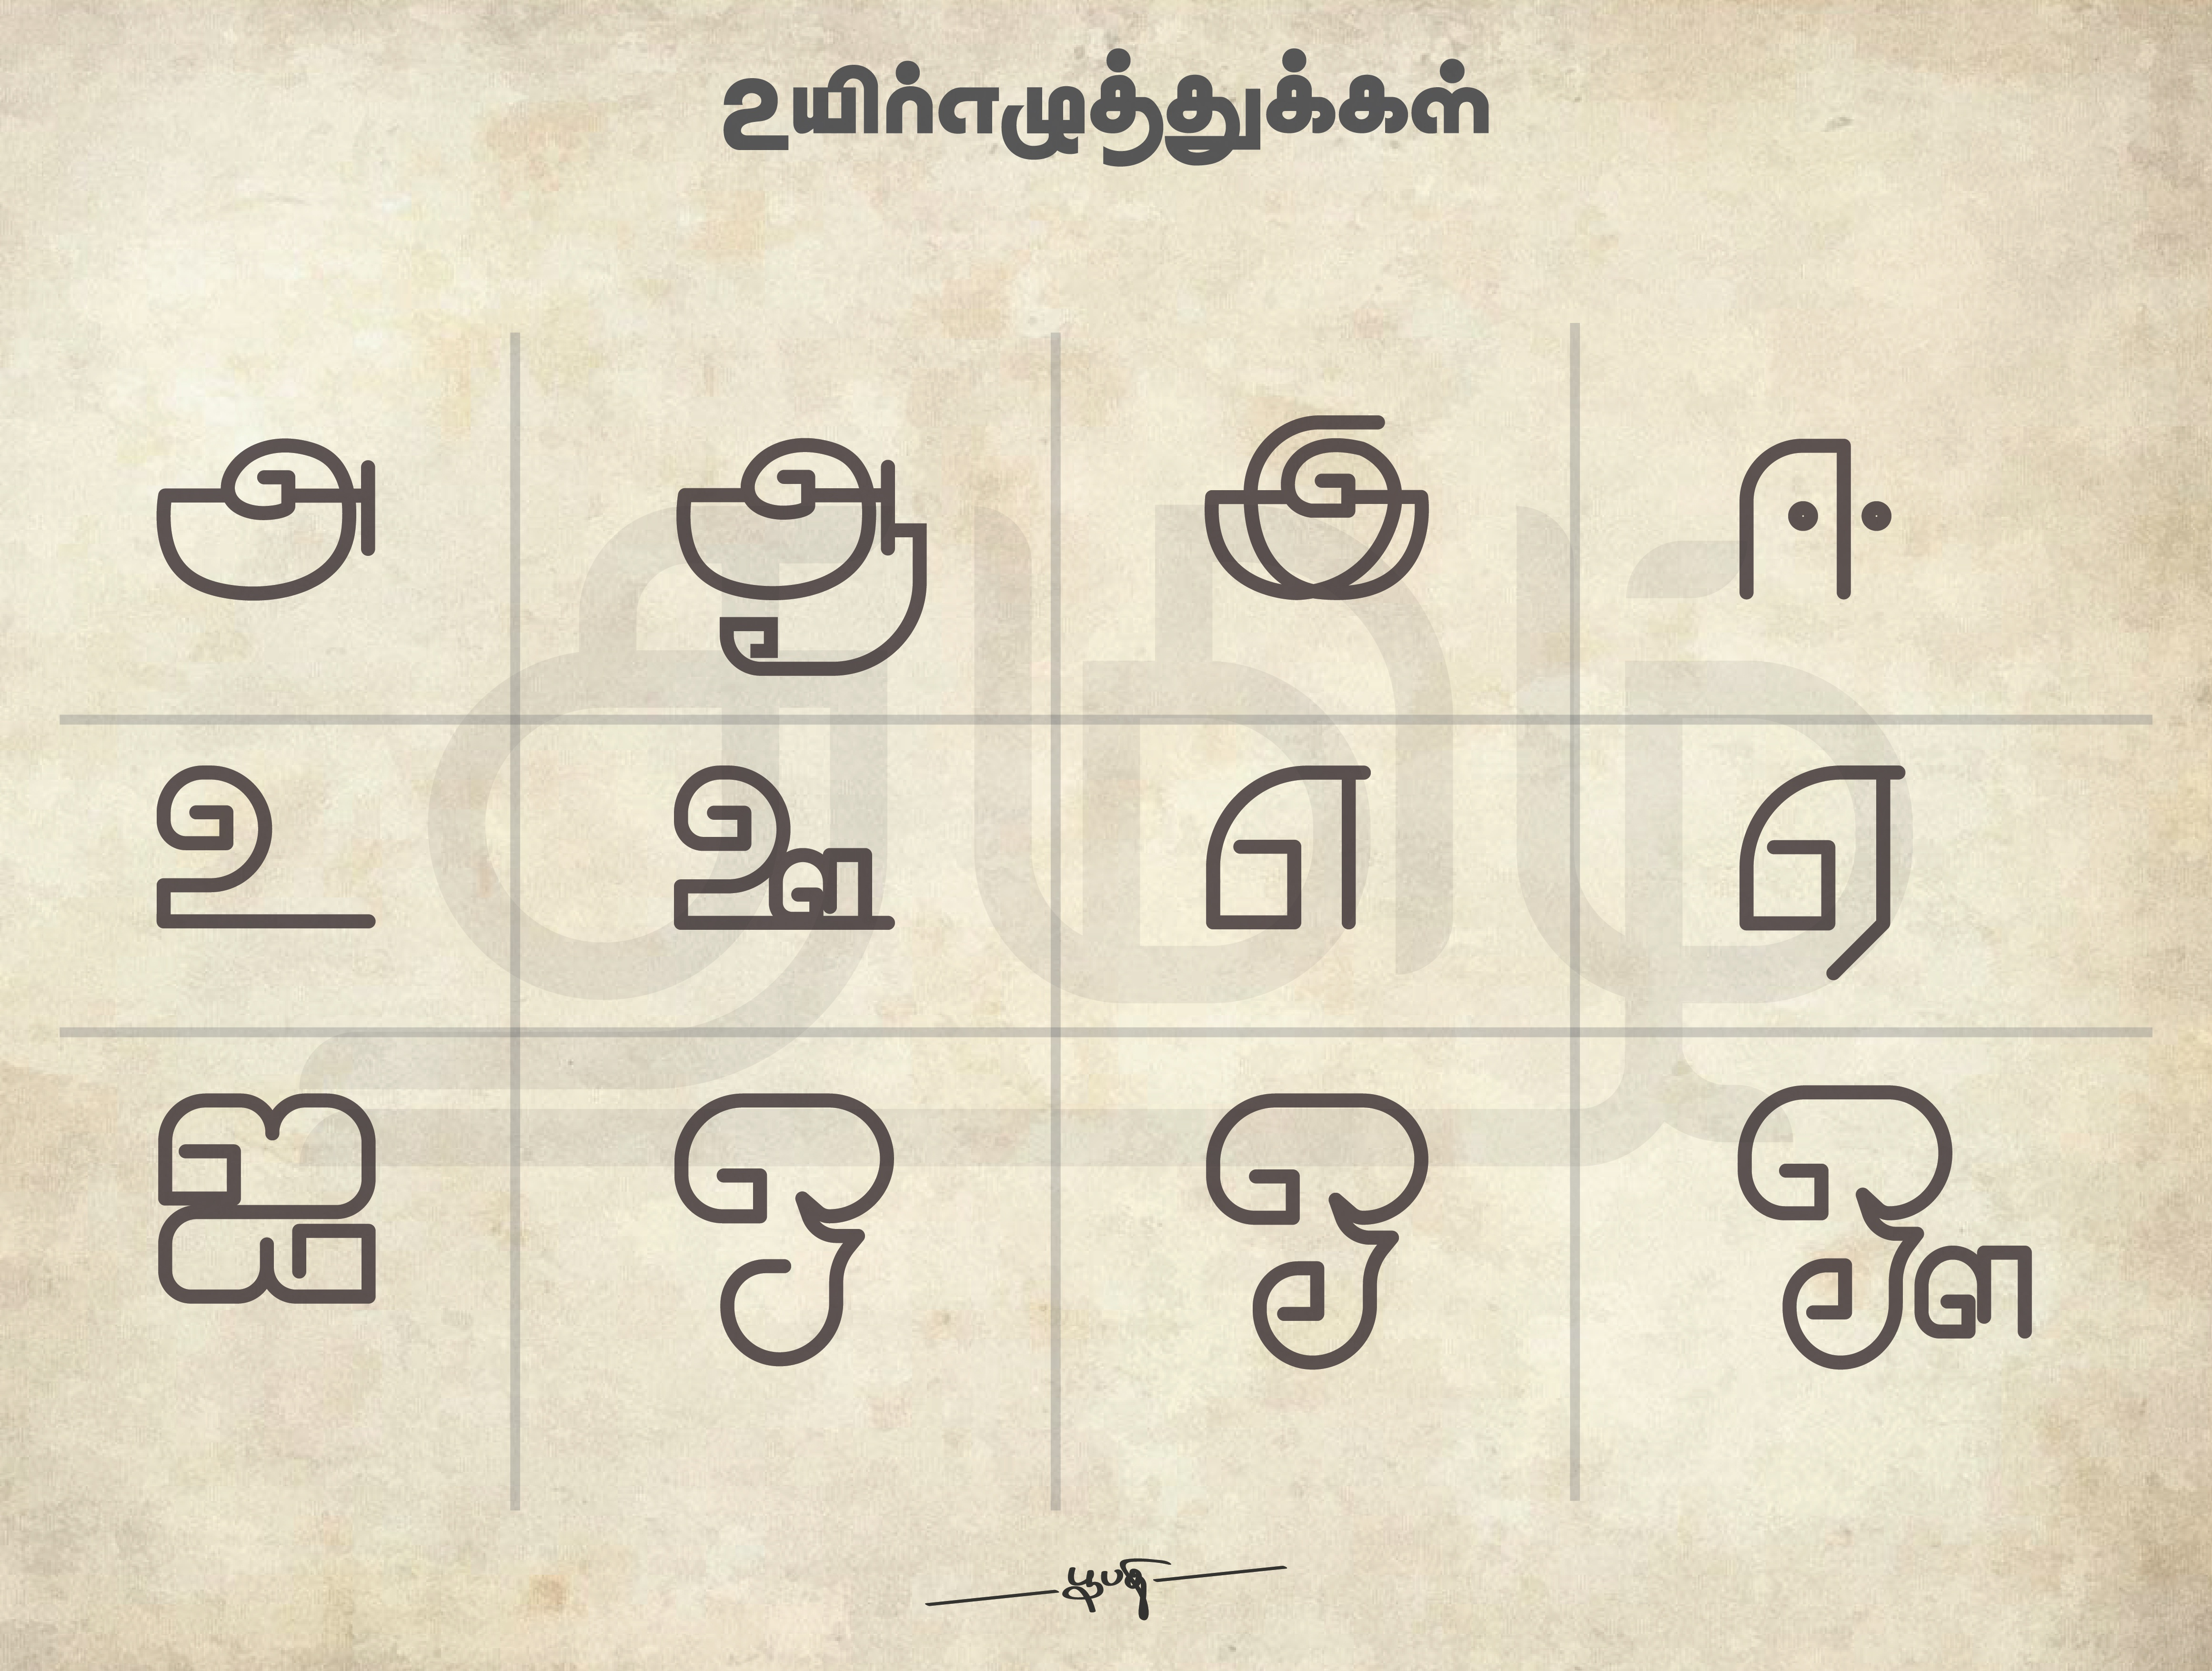 Tamil letters rgb 01 01